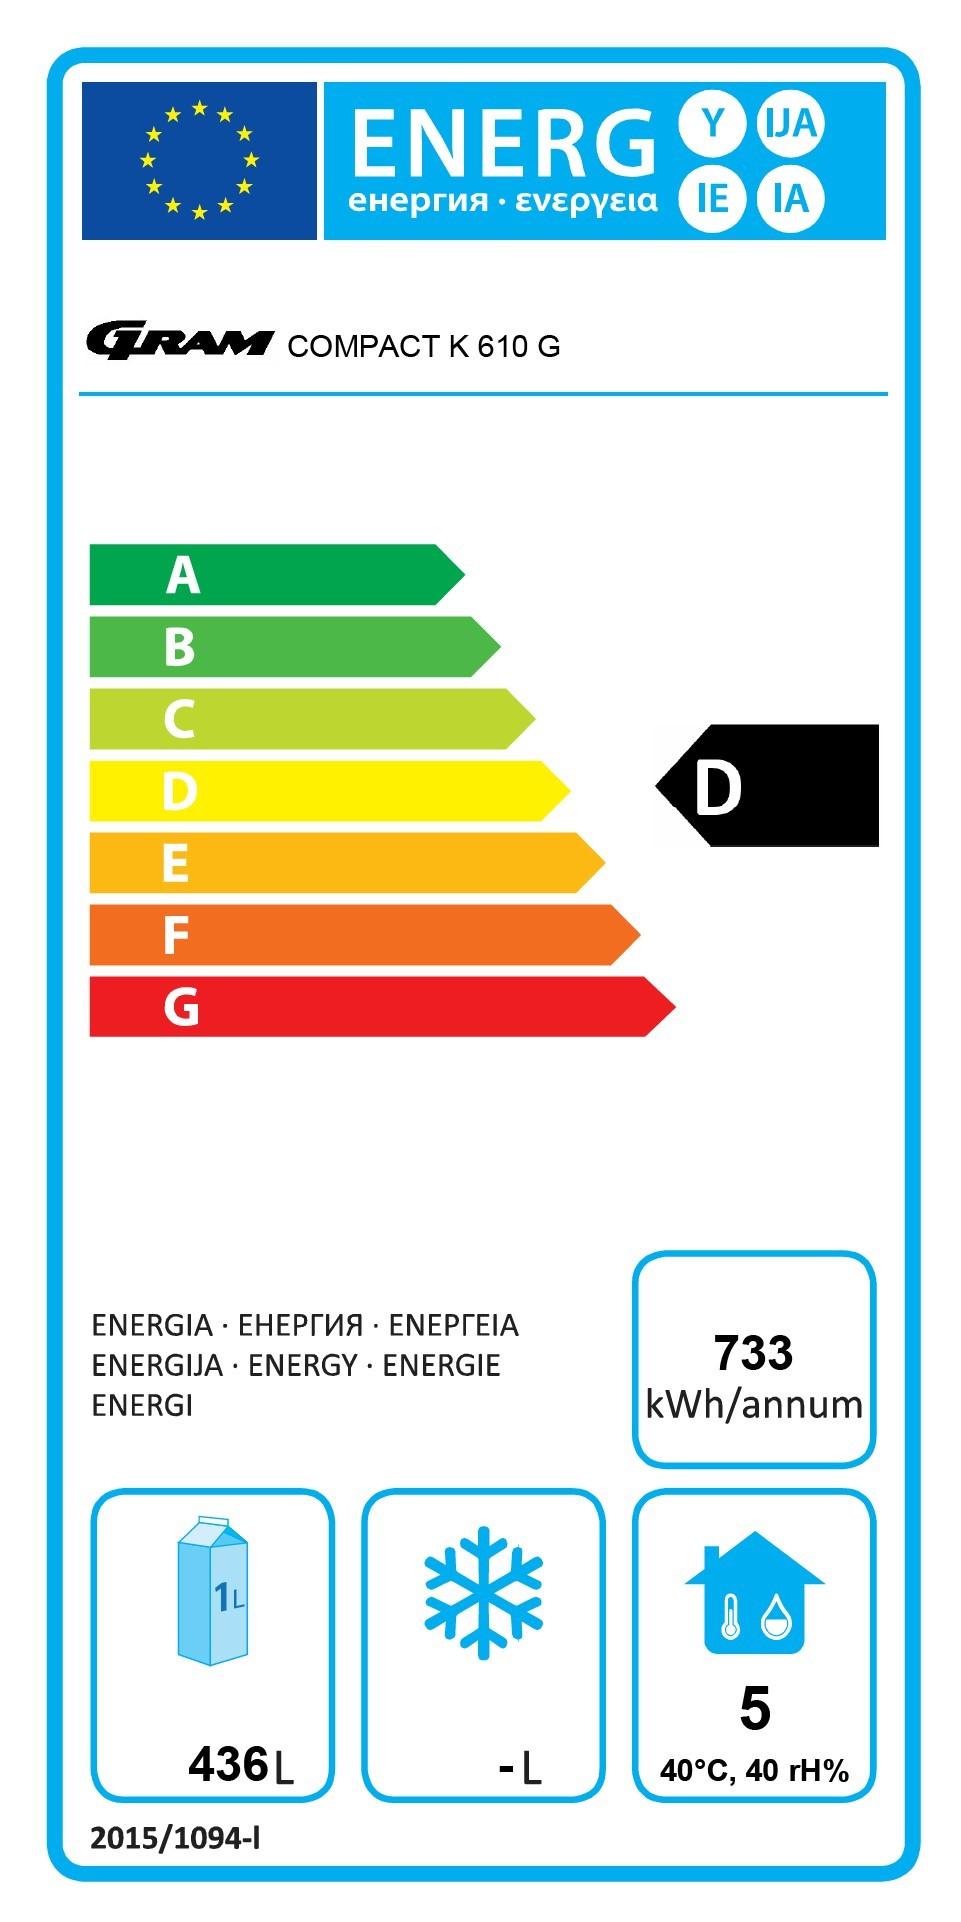 COMPACT K 610 LG C 4N 513 Ltr Single Door Upright Fridge Energy Rating